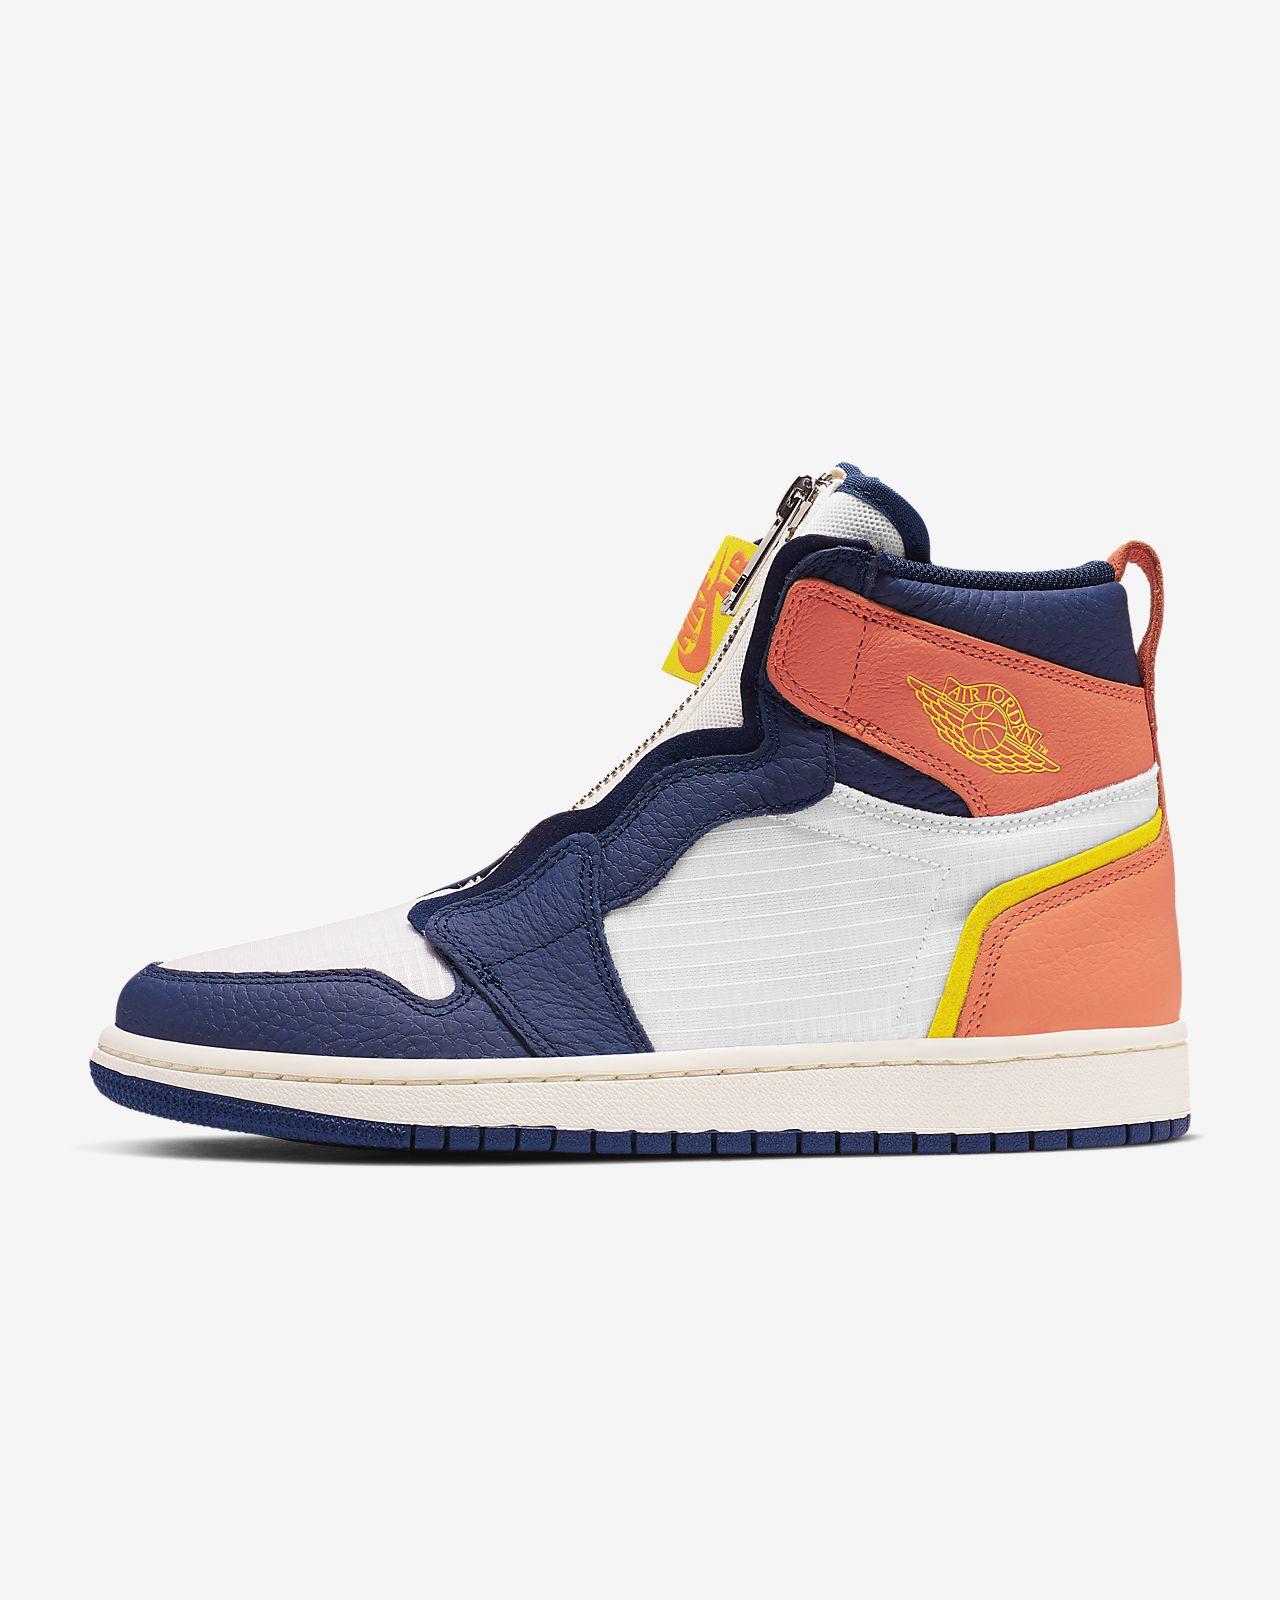 Air Jordan 1 High Zip 女子运动鞋